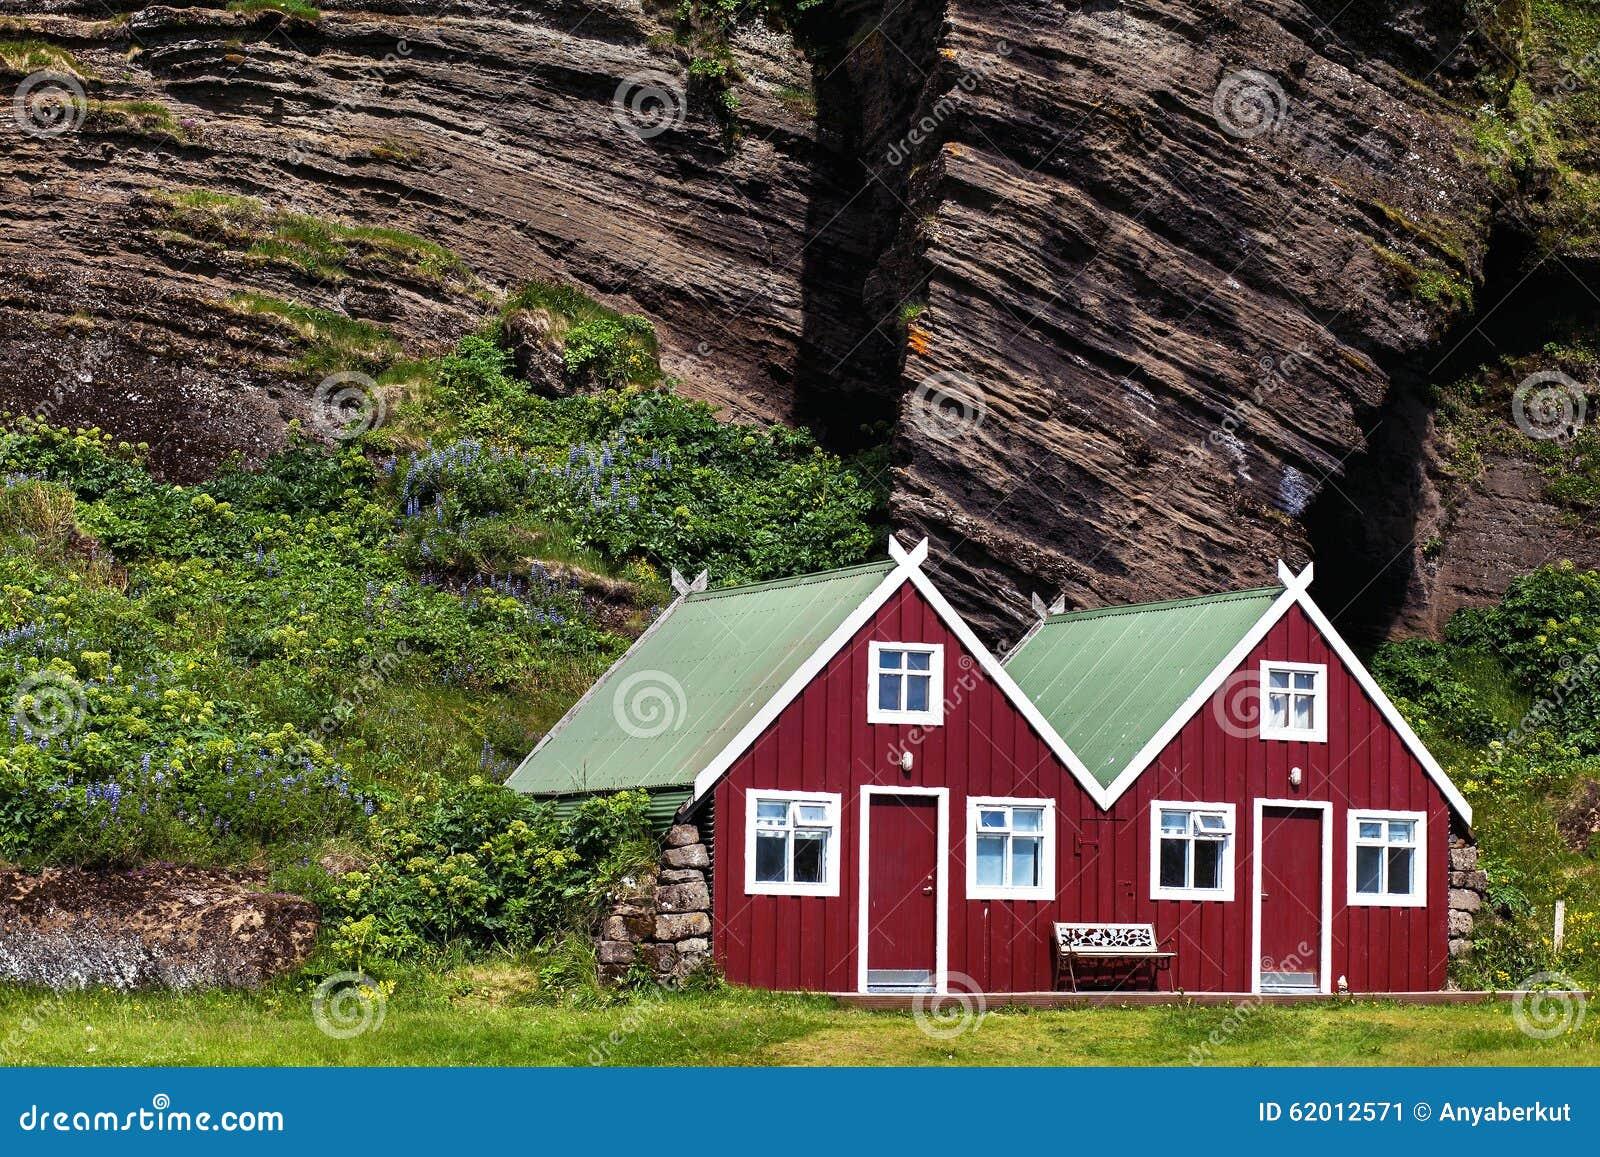 Scandinavian houses stock image image of town nature - Casas escandinavas ...